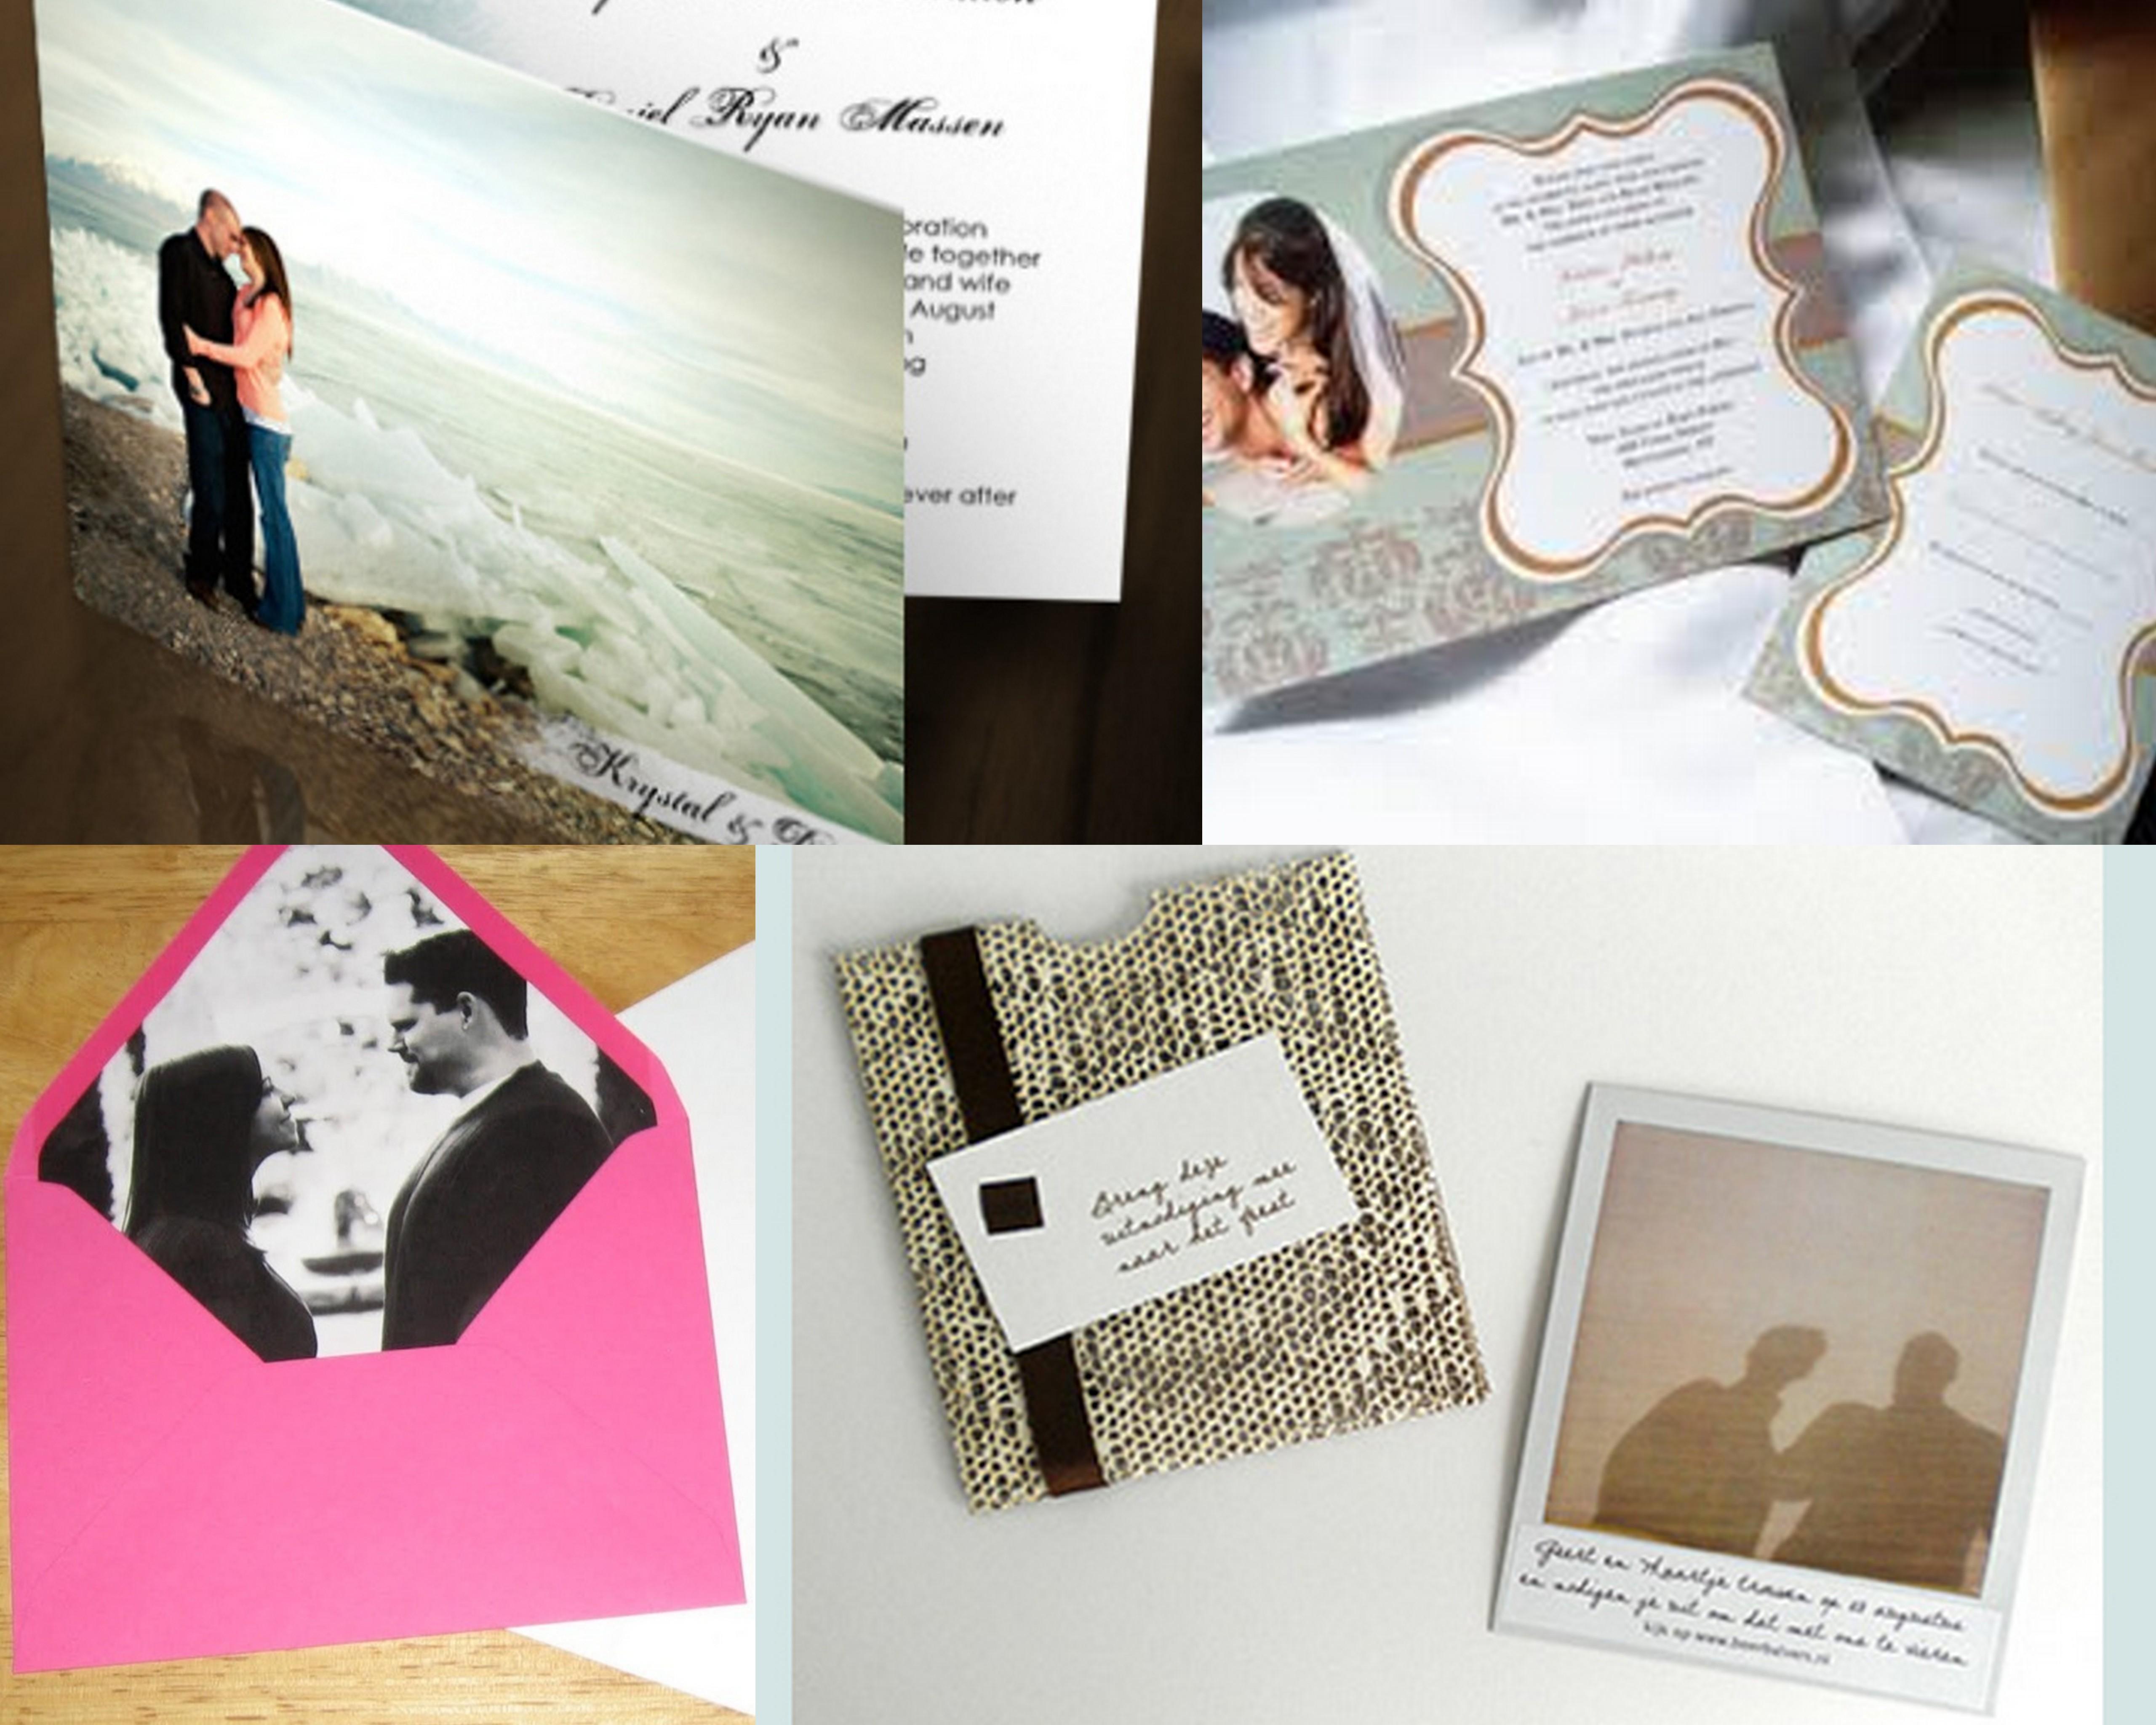 how to make use of do it yourself diy wedding invitation kit diy wedding invitation A2Zweddingcards DIY wedding cards